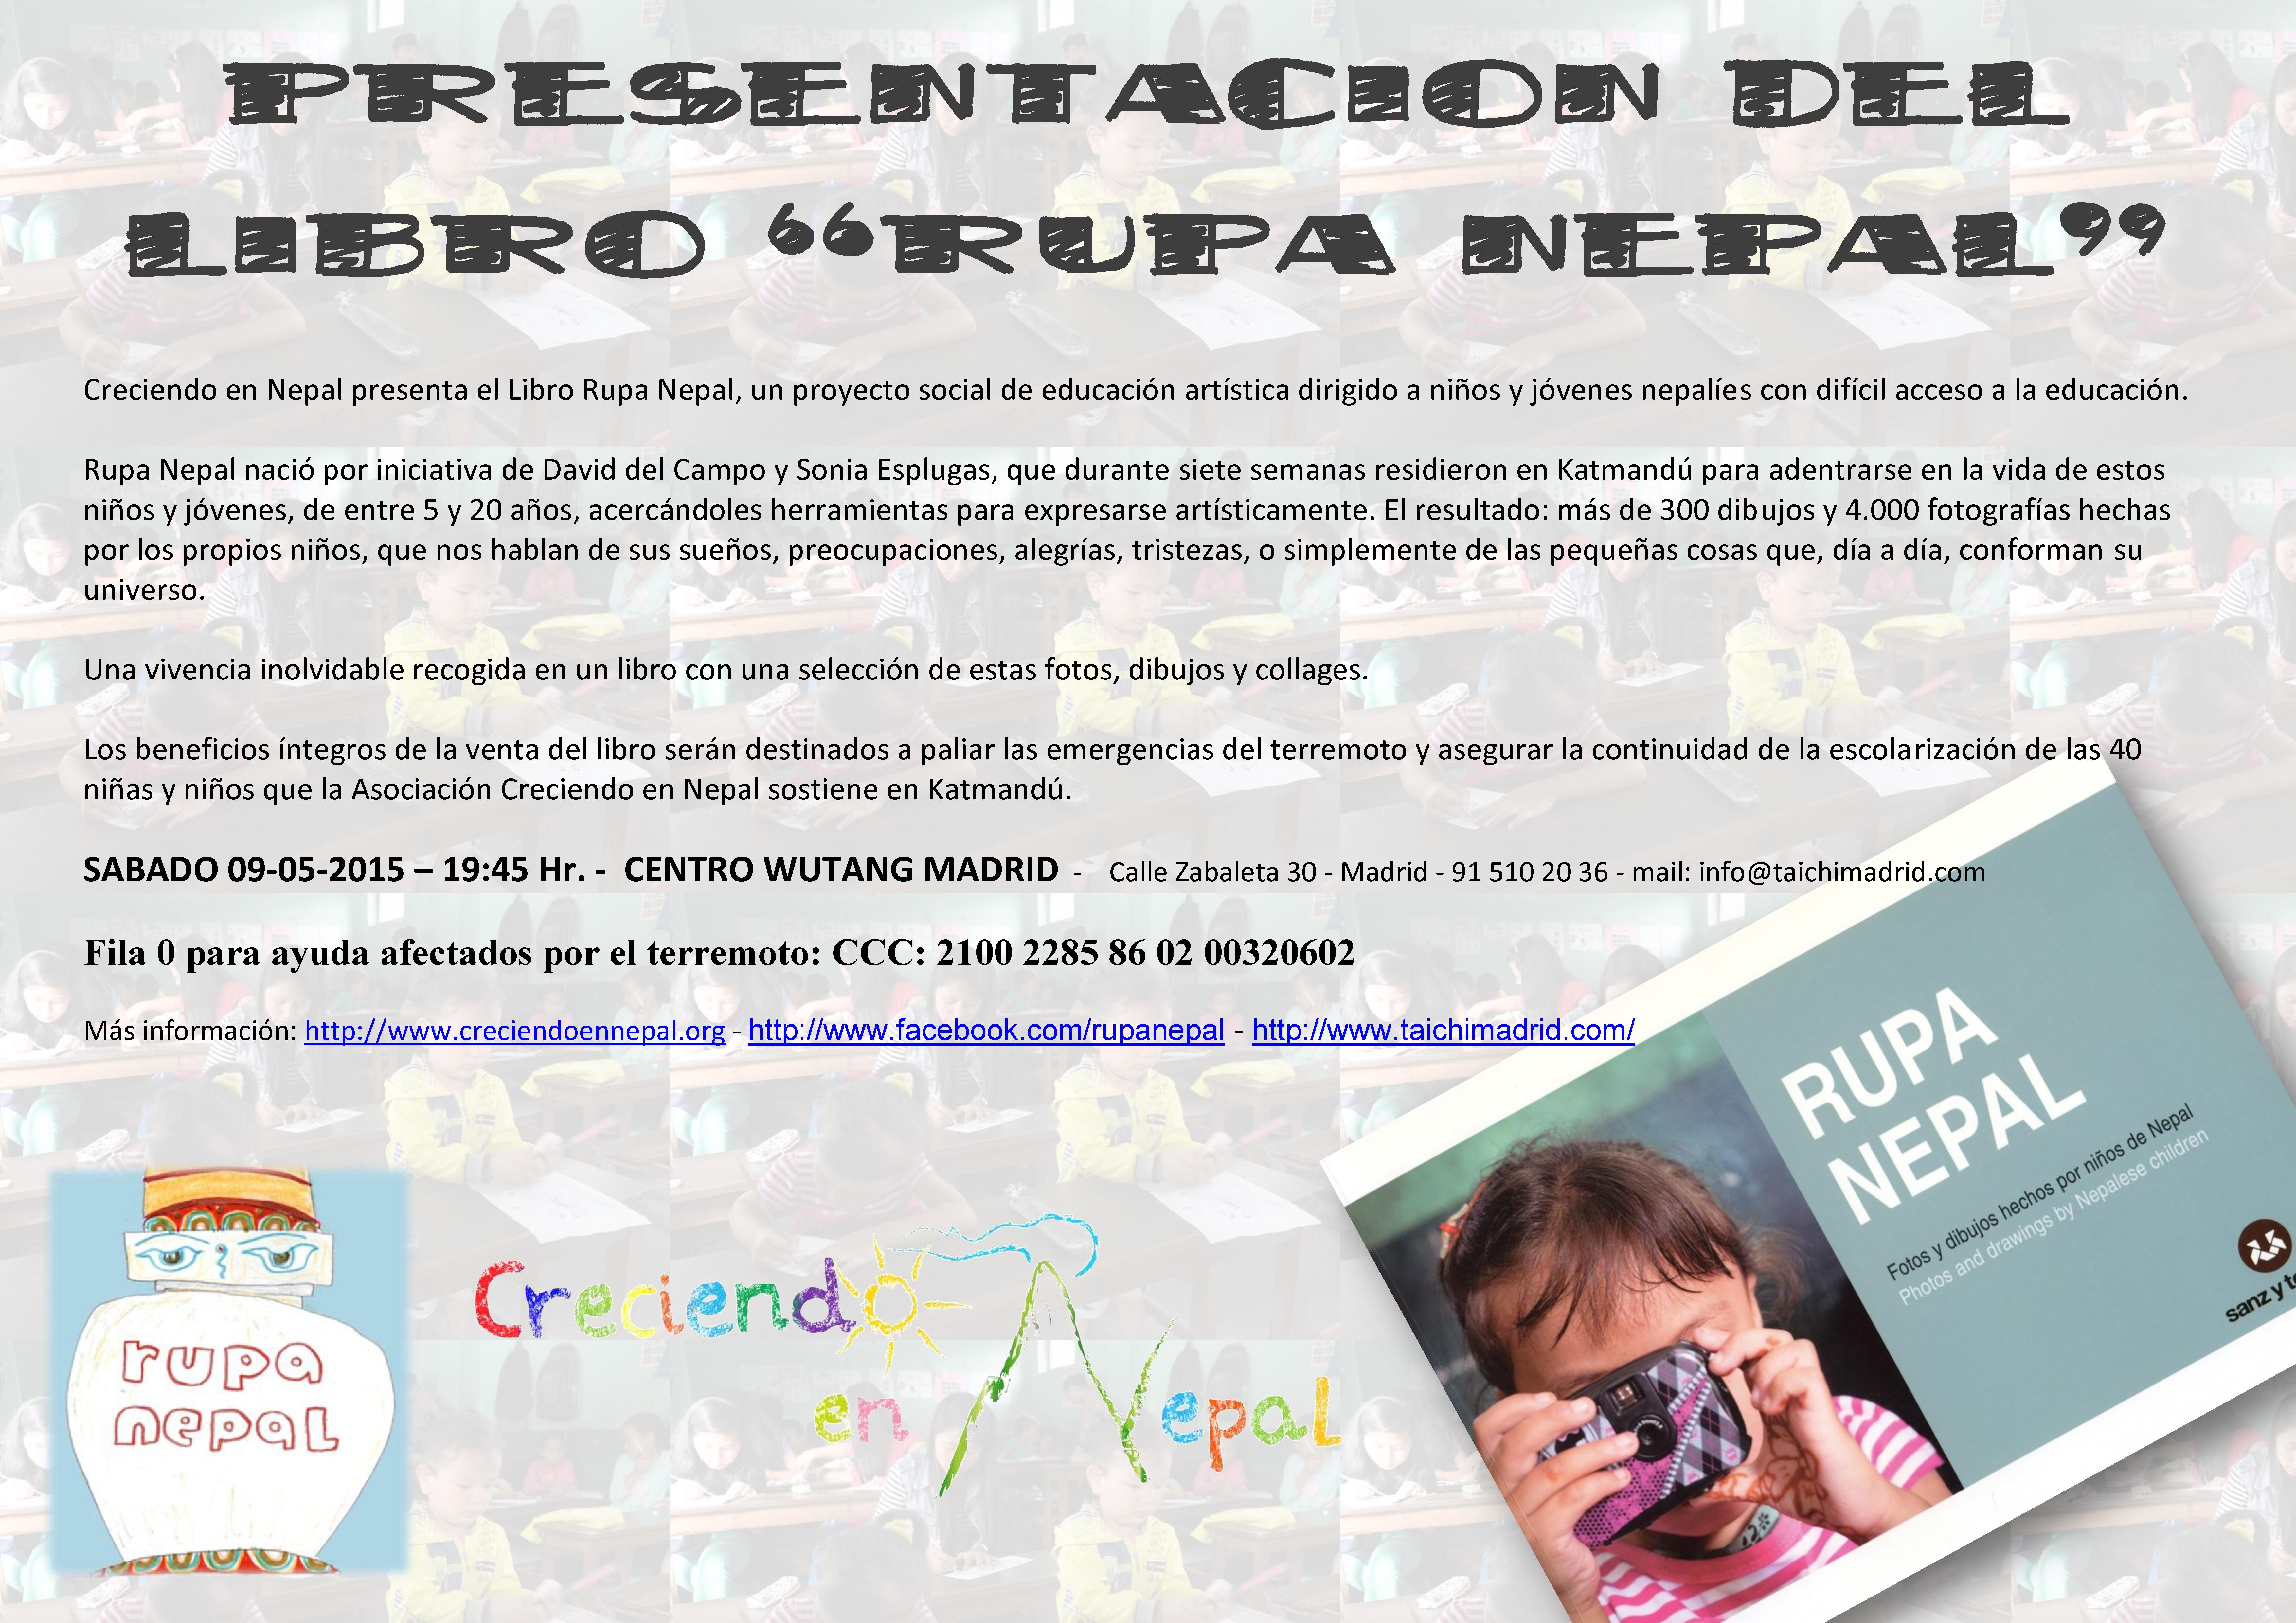 Cartel Presentación Wutang Madrid